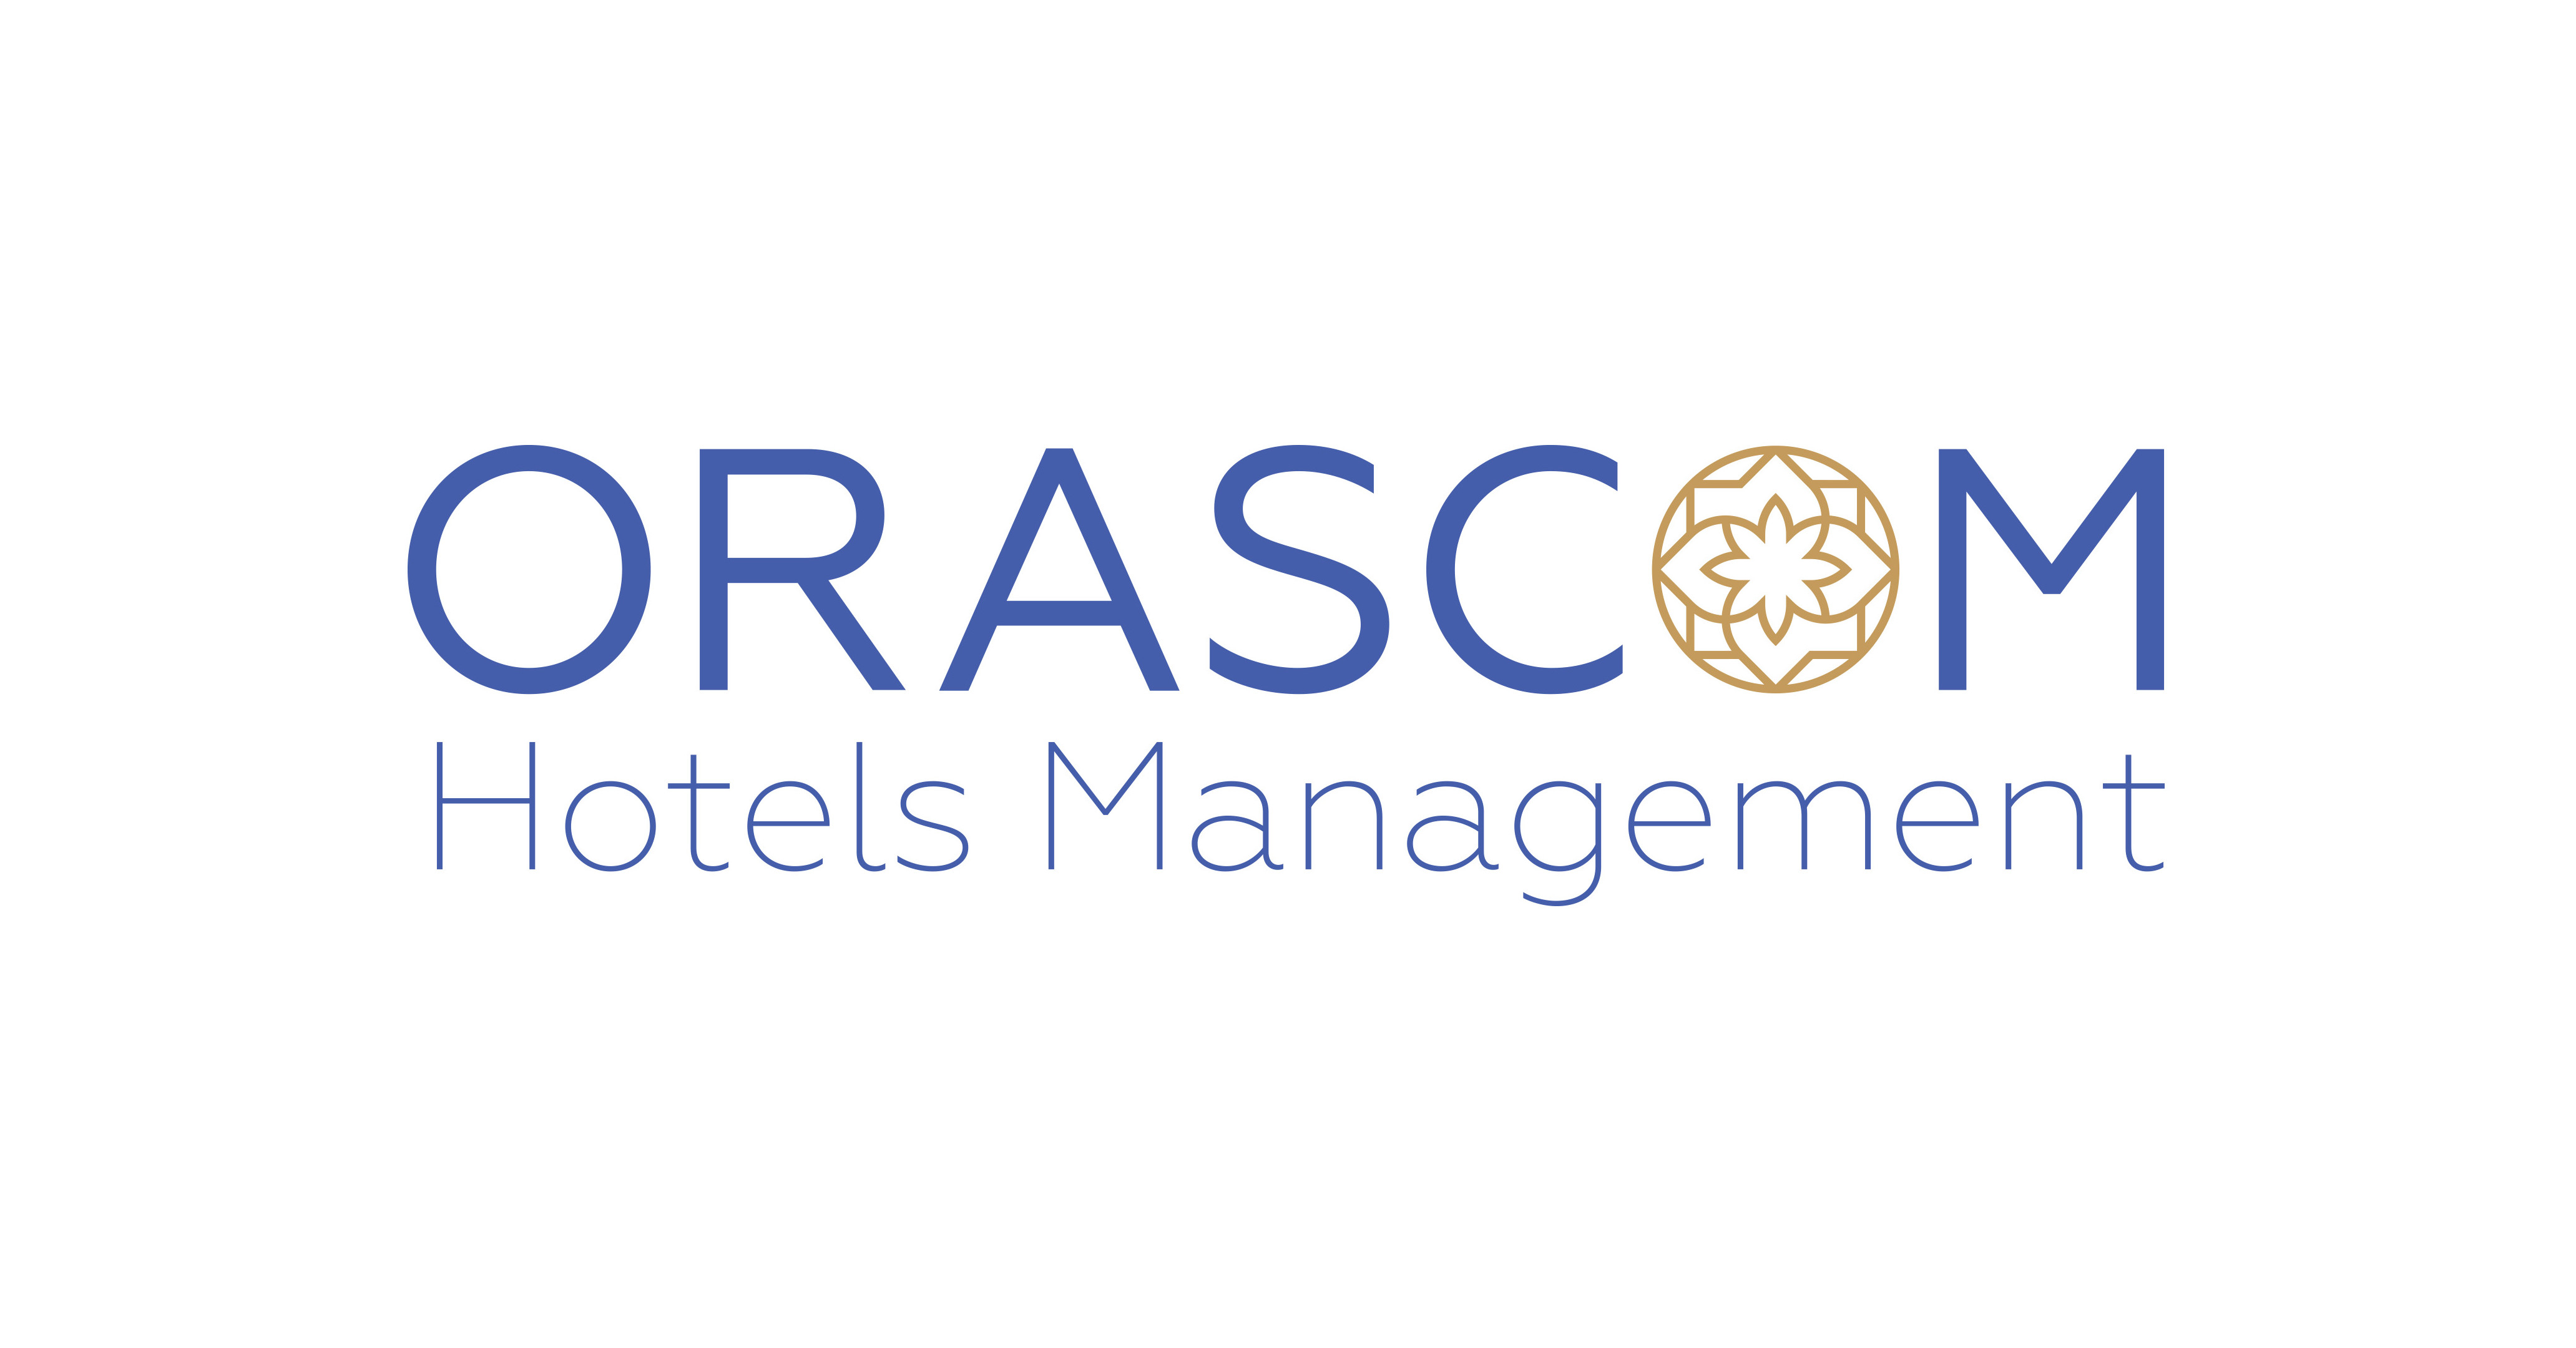 Job: Digital Marketing Executive/Red Sea at Orascom Hotel